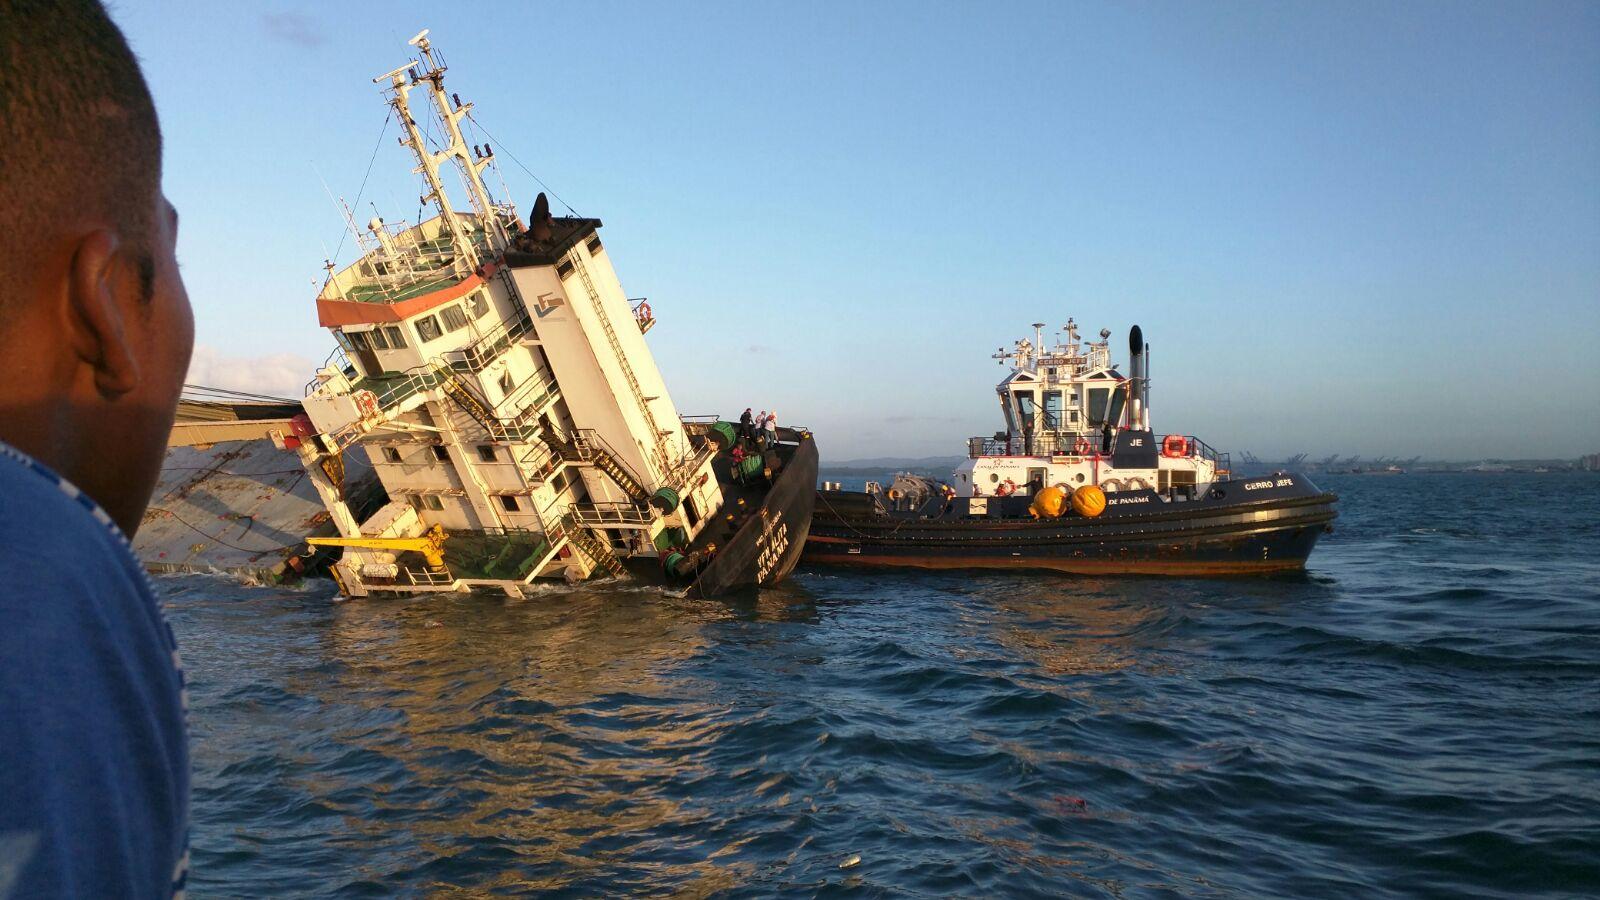 Video Cargo Vessel Vfm Alita Sinks Off Panama